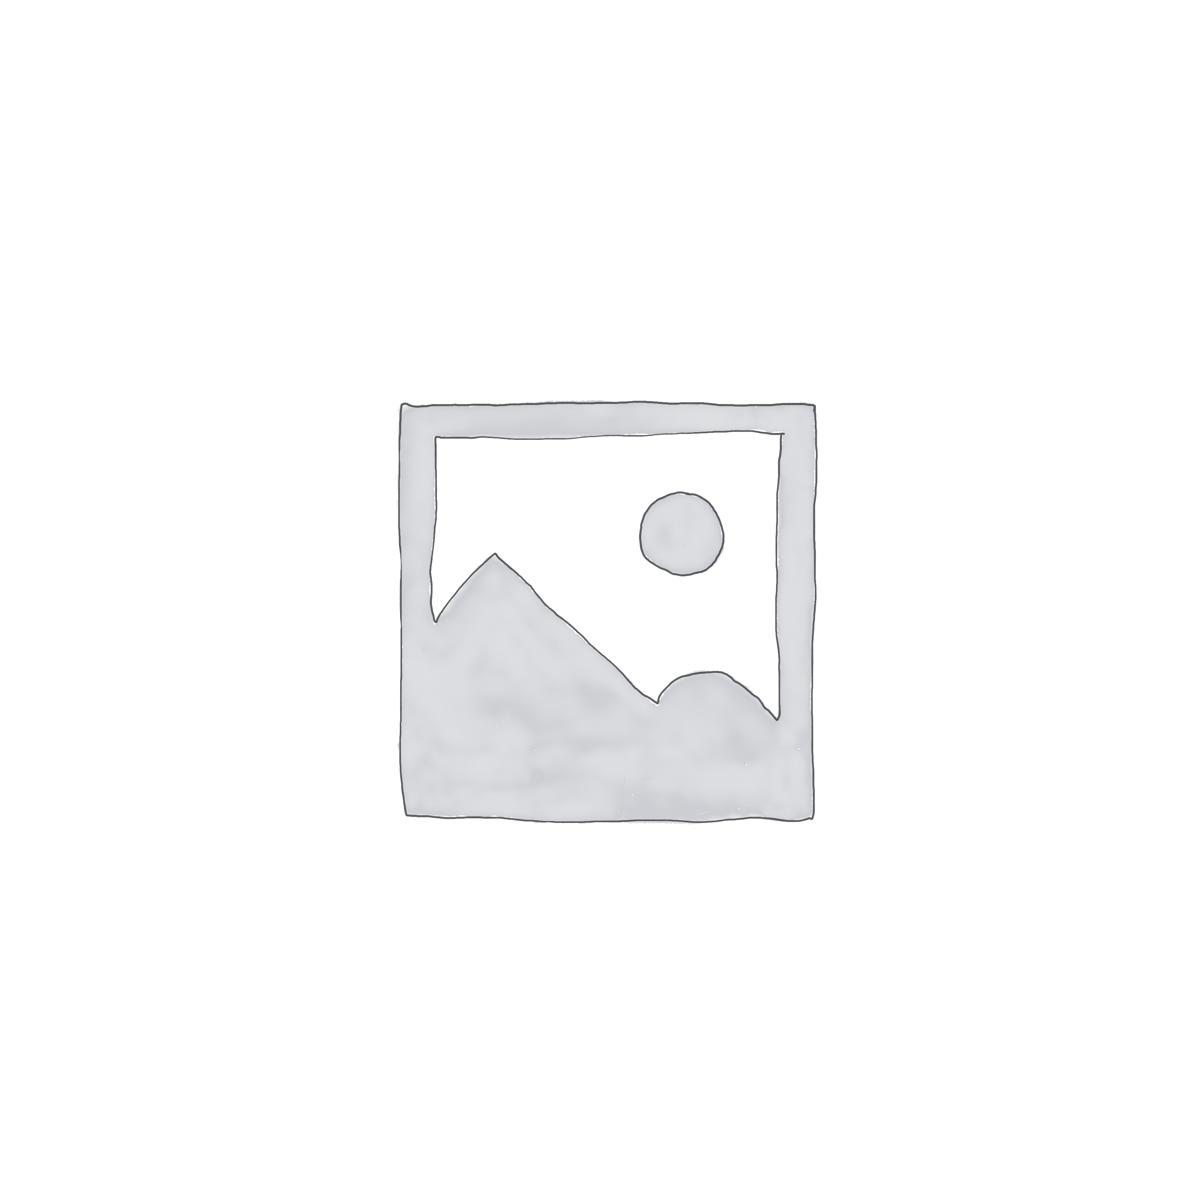 Purple Black Geometric Shapes Wallpaper Mural